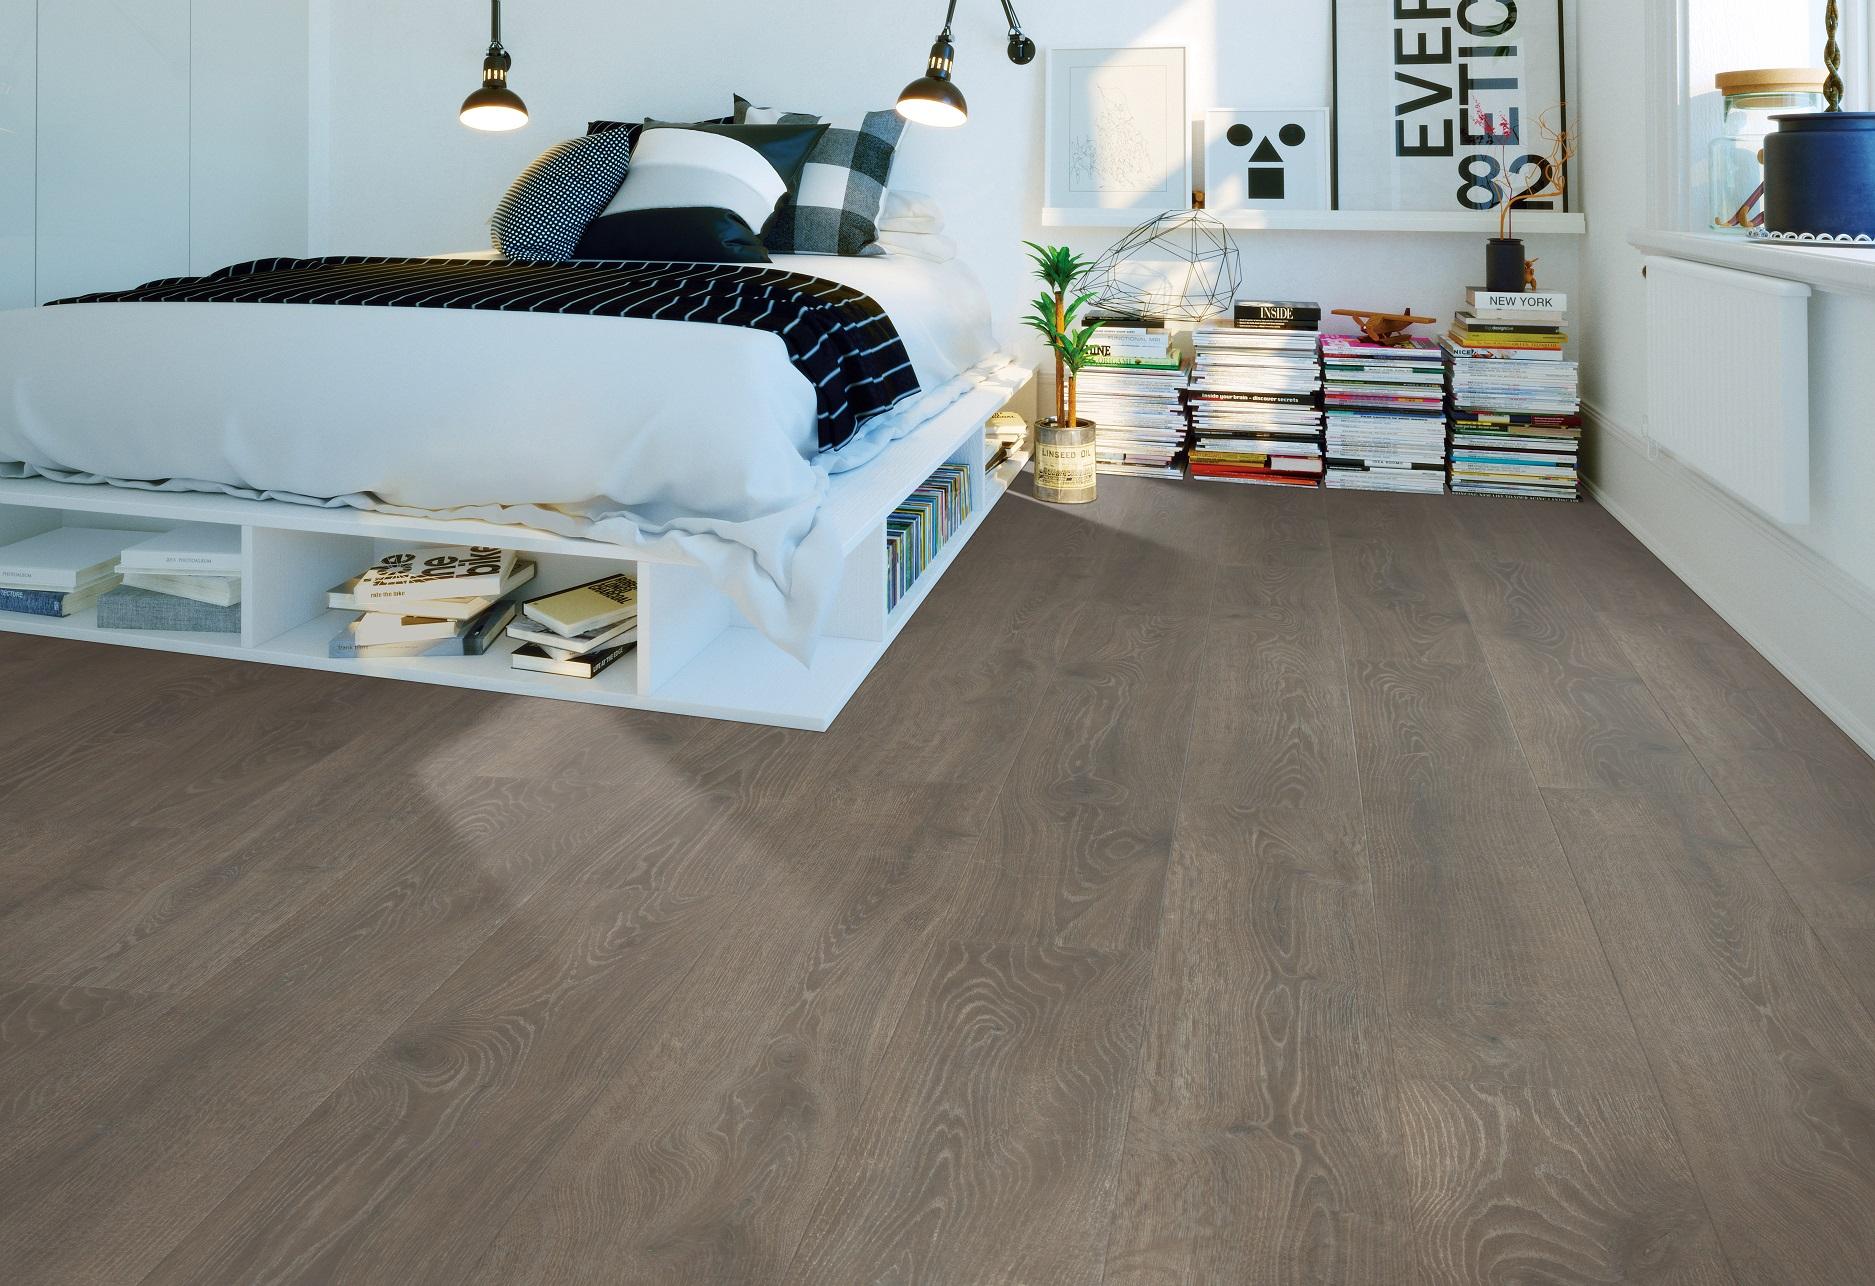 Waterproof laminate flooring in an Amissville, VA bedroom